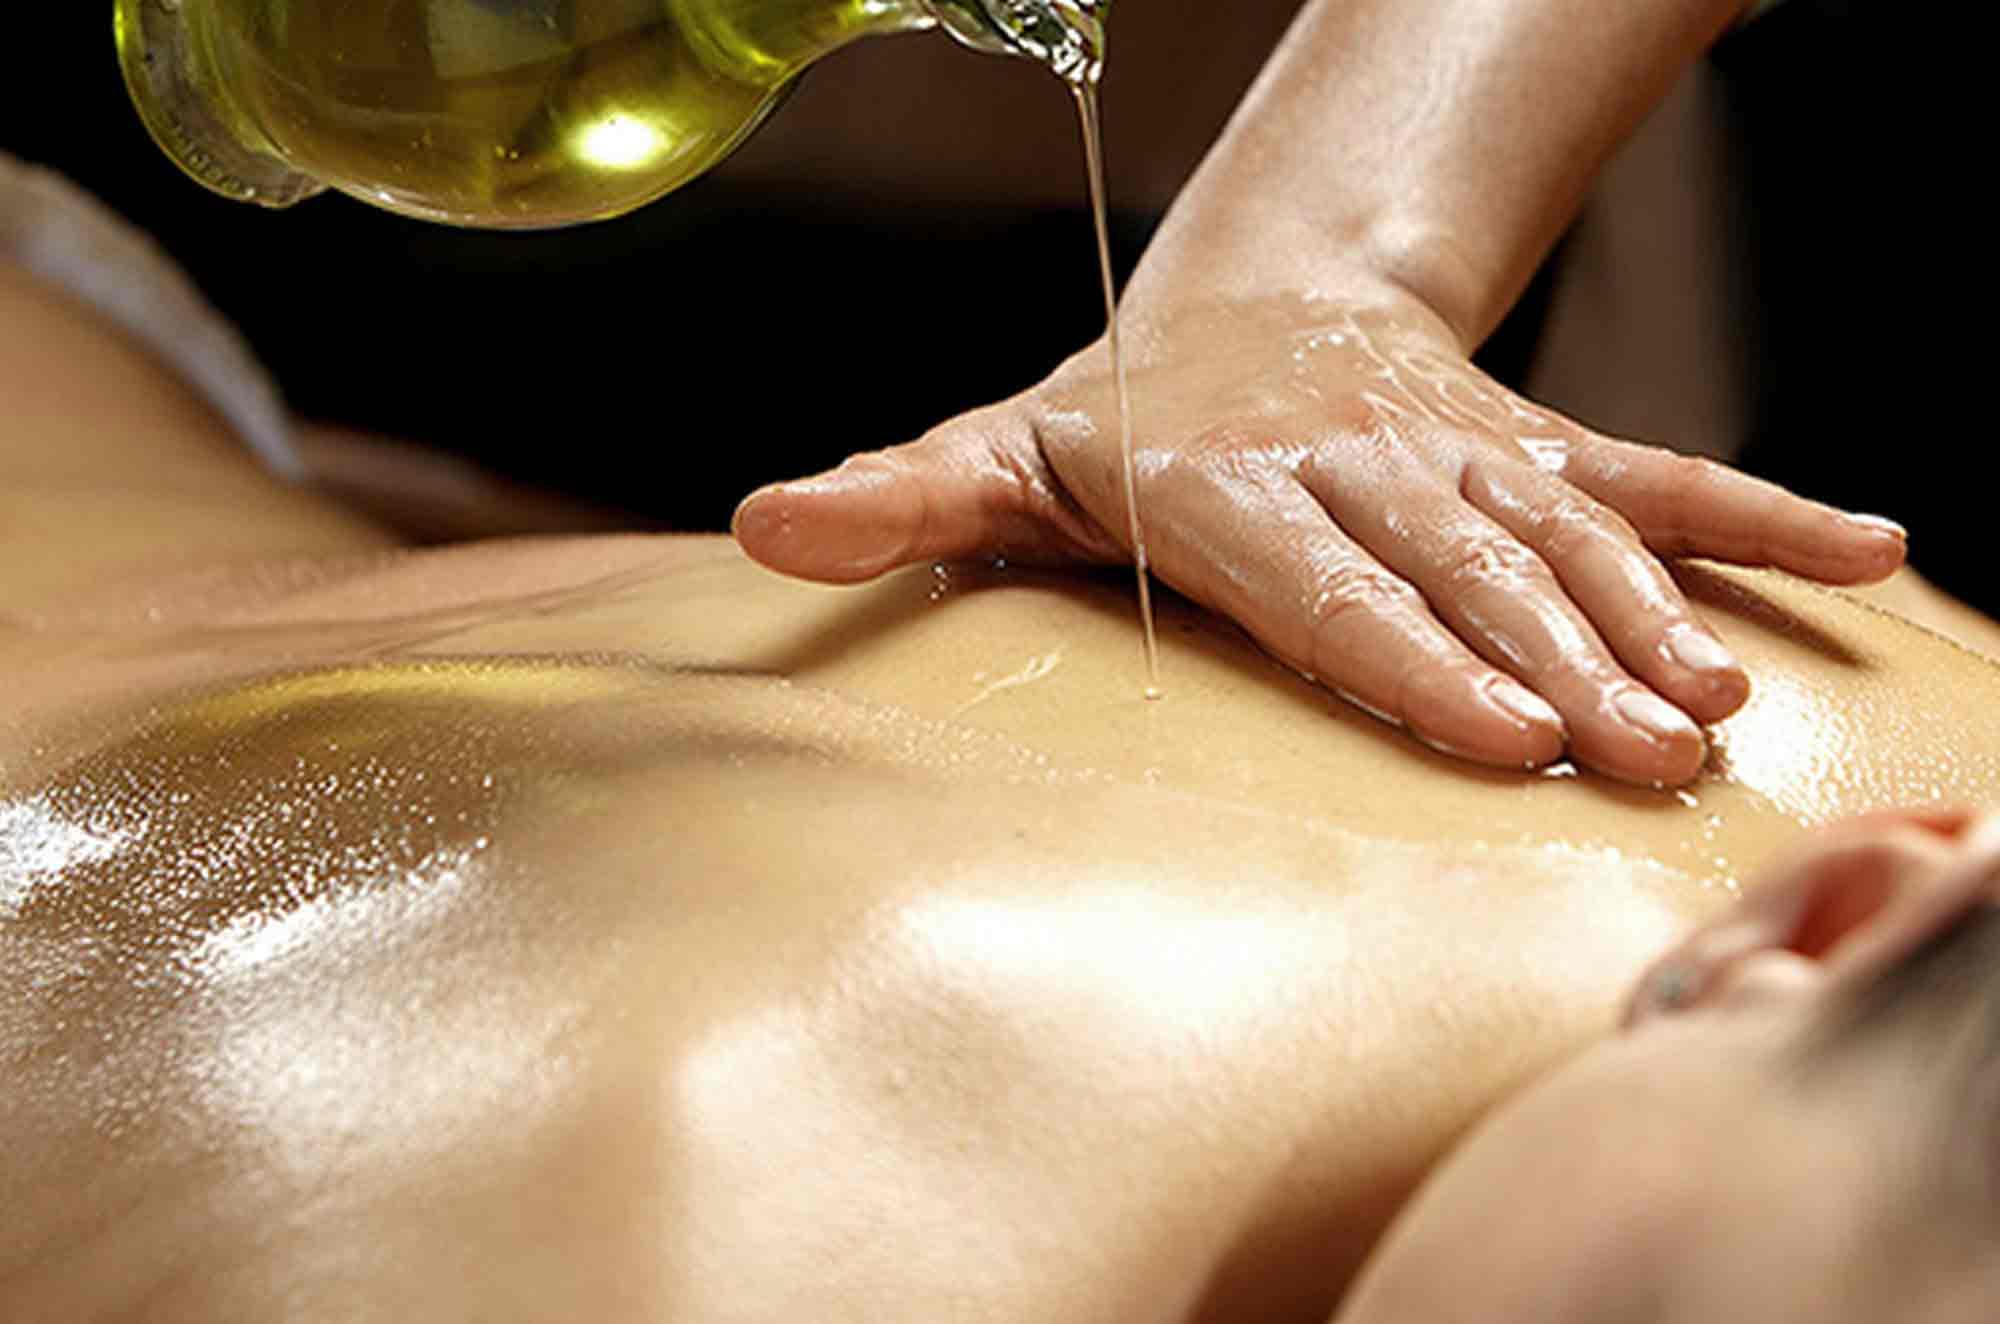 Sensual Massage Oils